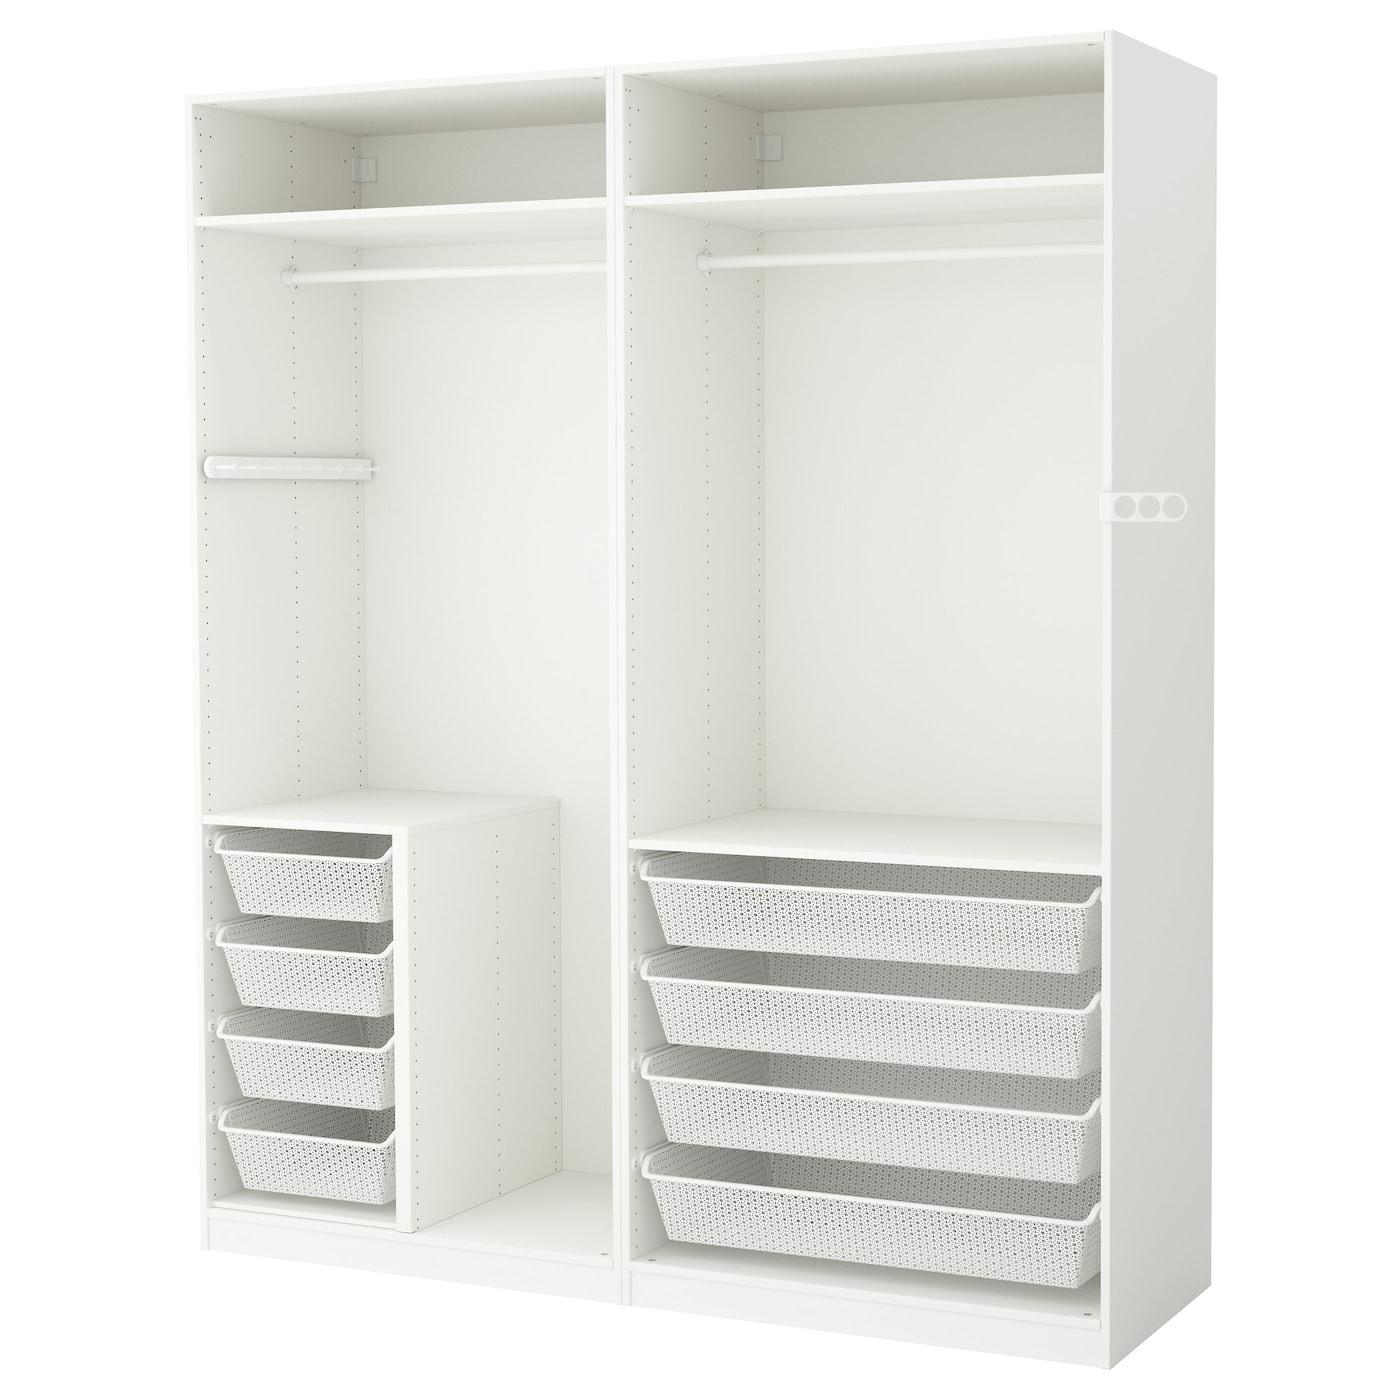 pax armoire penderie blanc 200 x 58 x 236 cm ikea. Black Bedroom Furniture Sets. Home Design Ideas